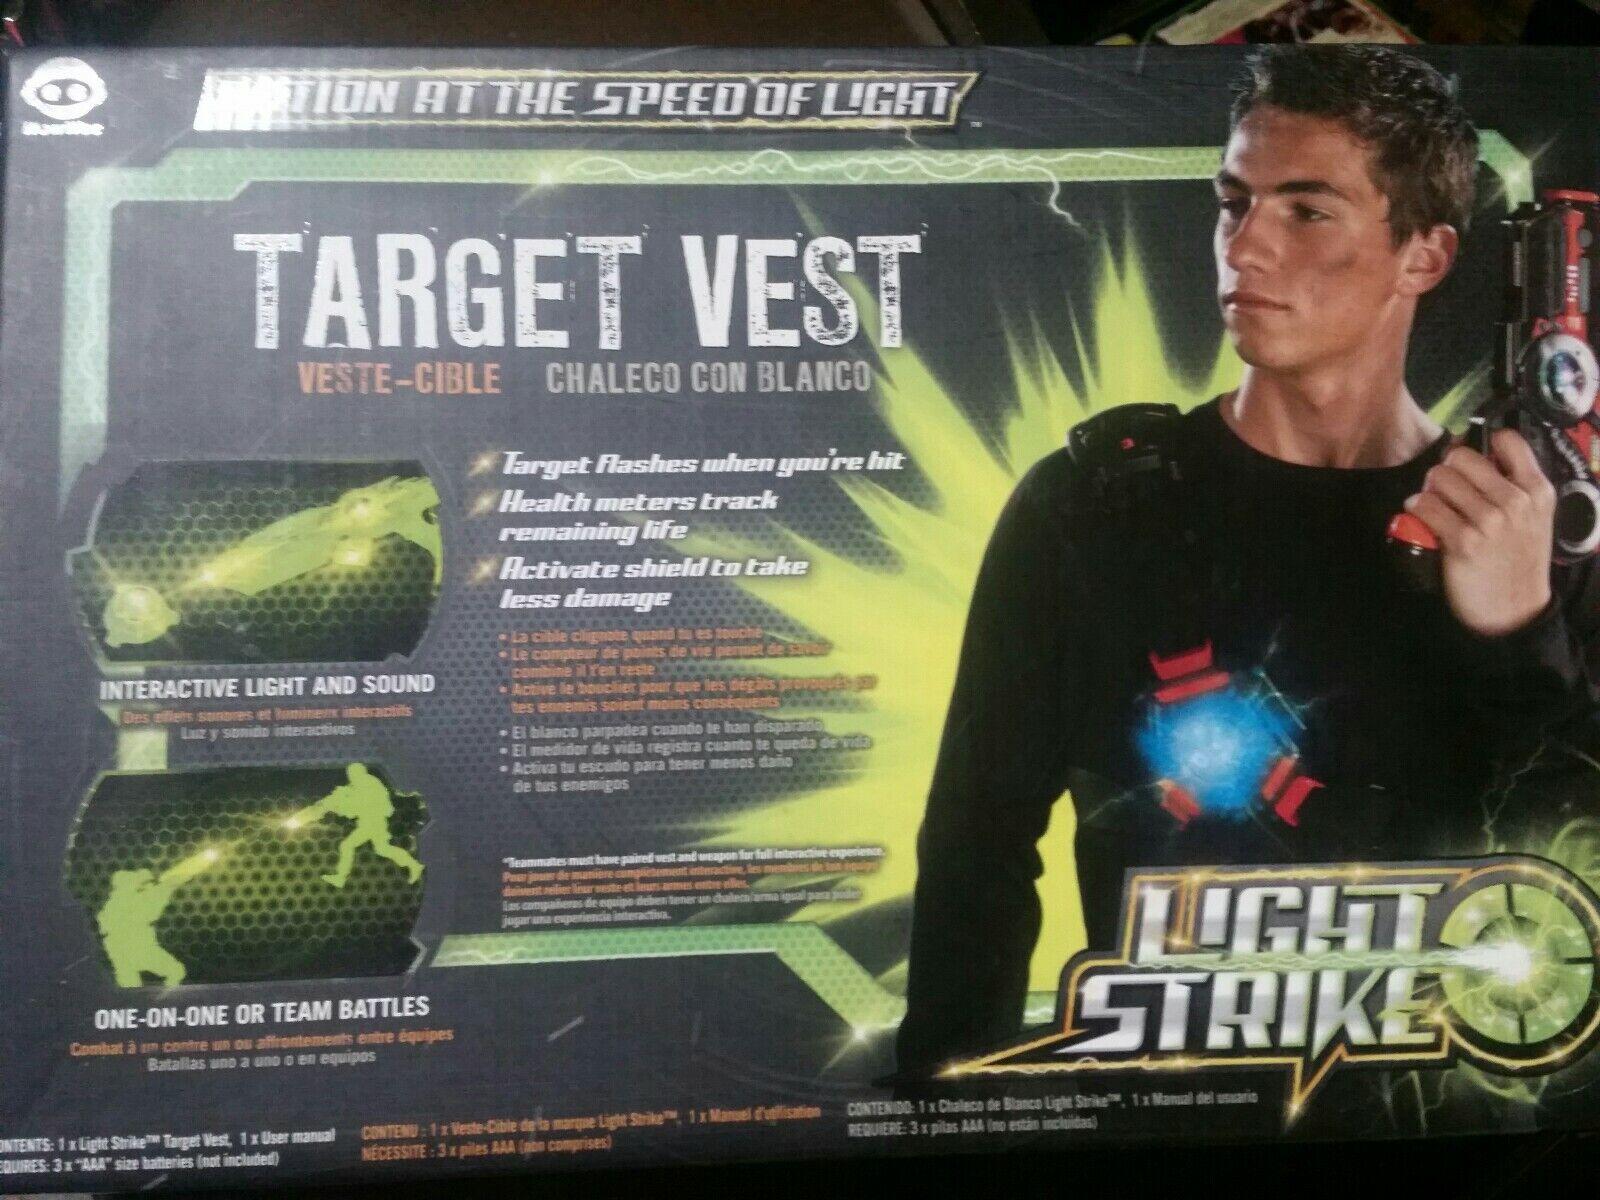 LIGHT STRIKE Tag Game TARGET VEST--WowWee--Health monitor; Friend Foe Strike ID